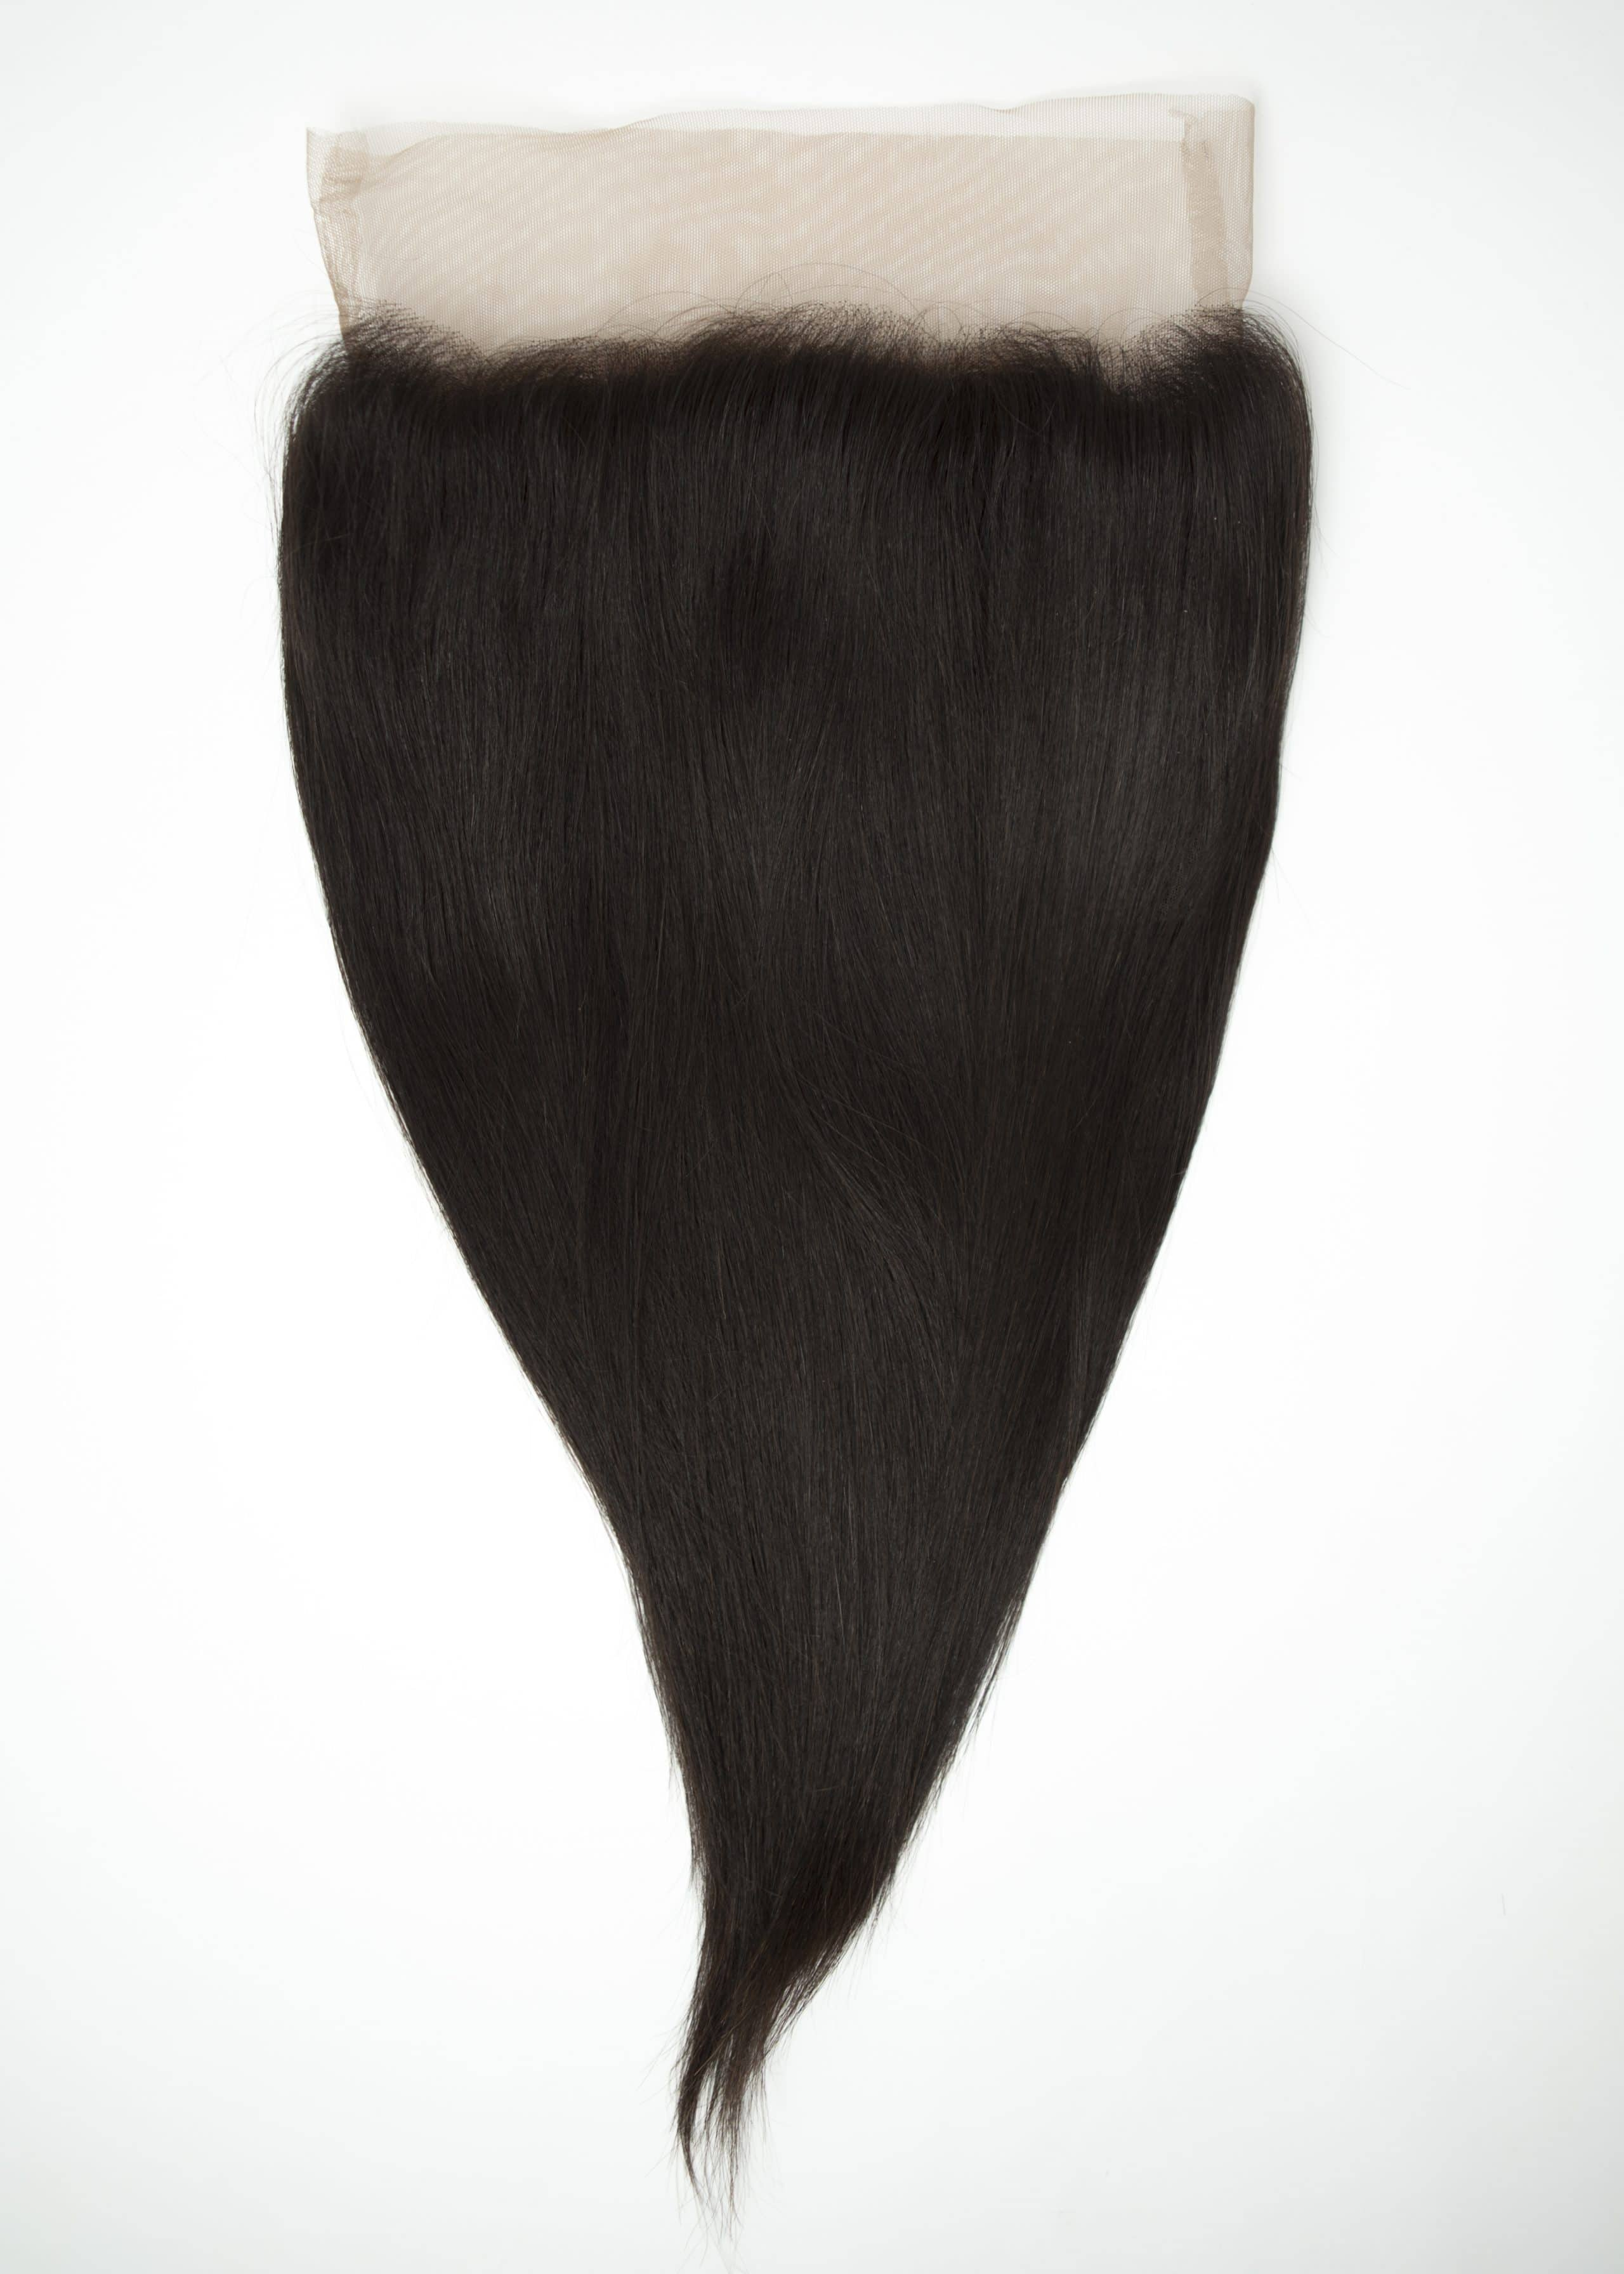 360 frontal straight human hair